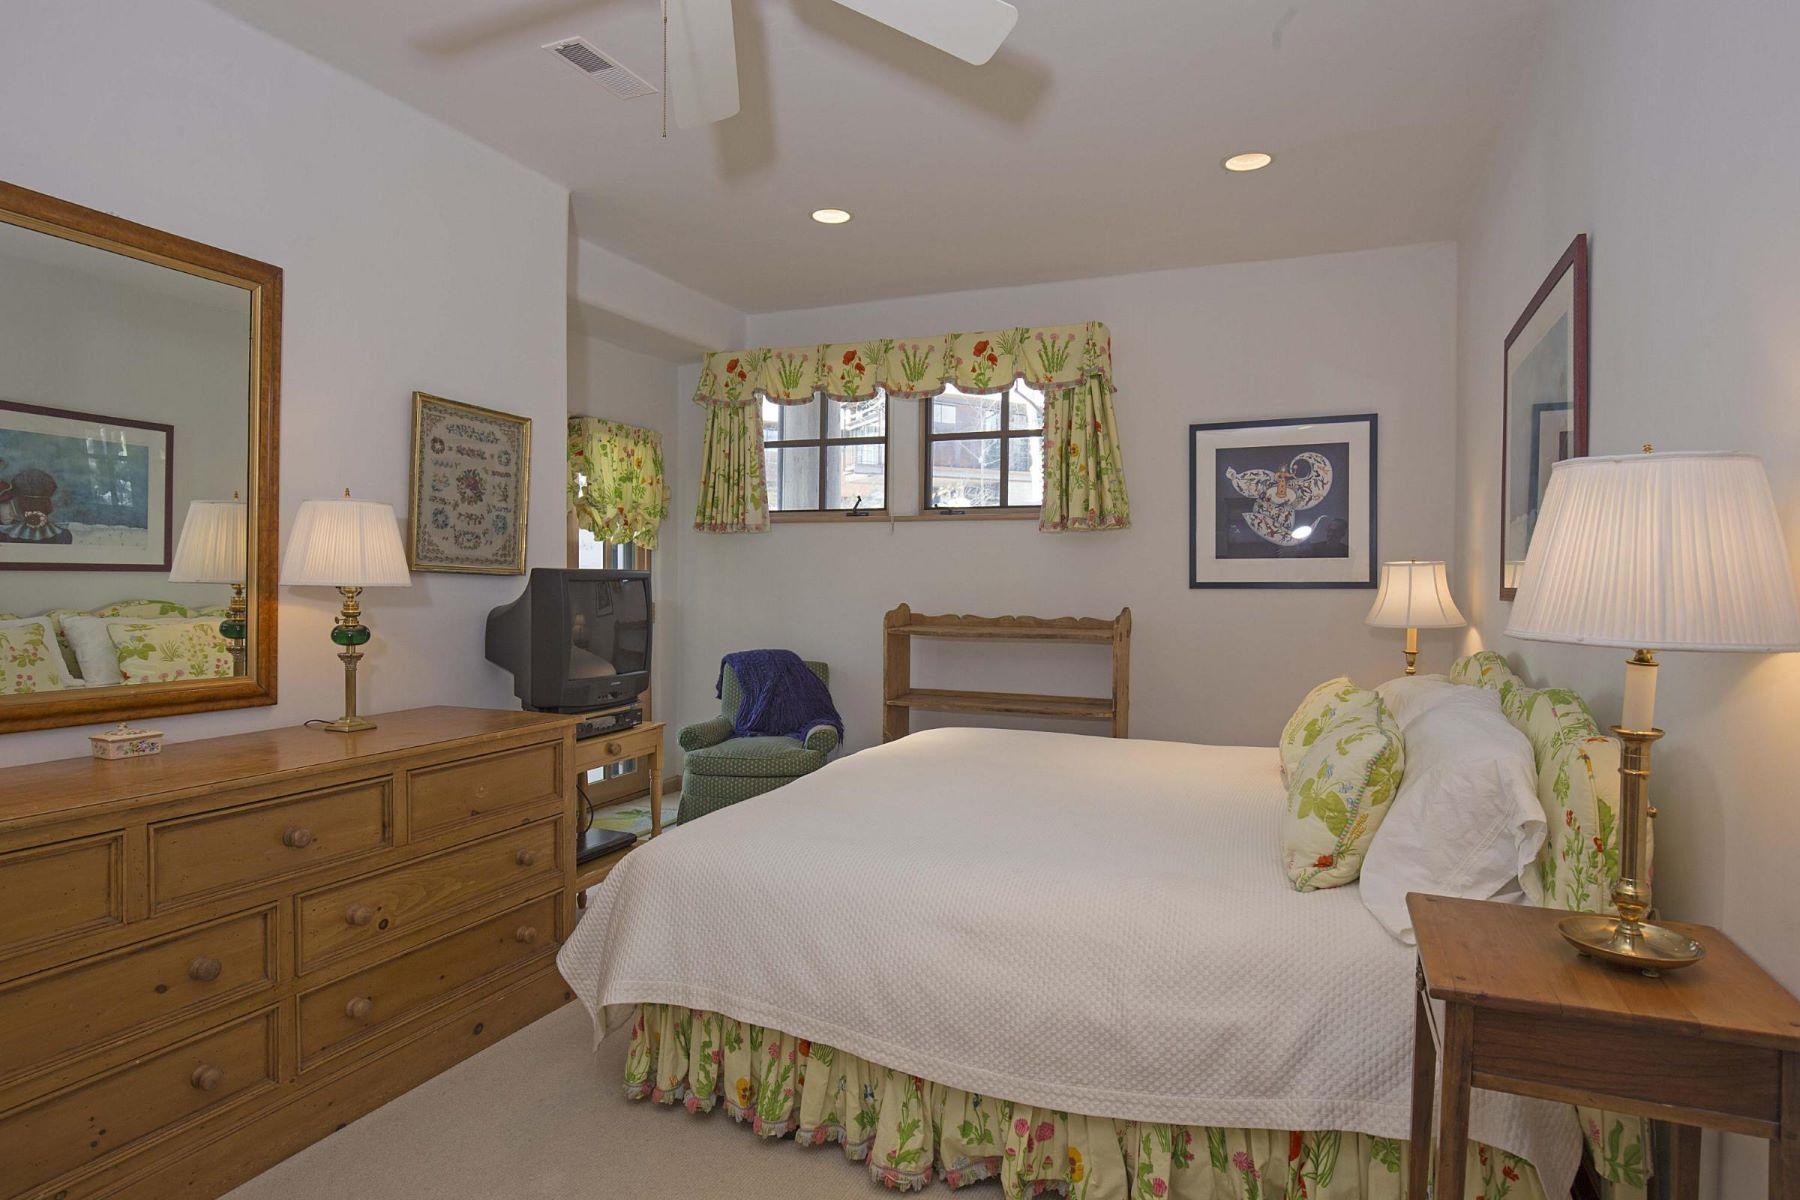 Additional photo for property listing at Bigwood Views 335 N. Bigwood Dr Ketchum, Idaho 83340 United States